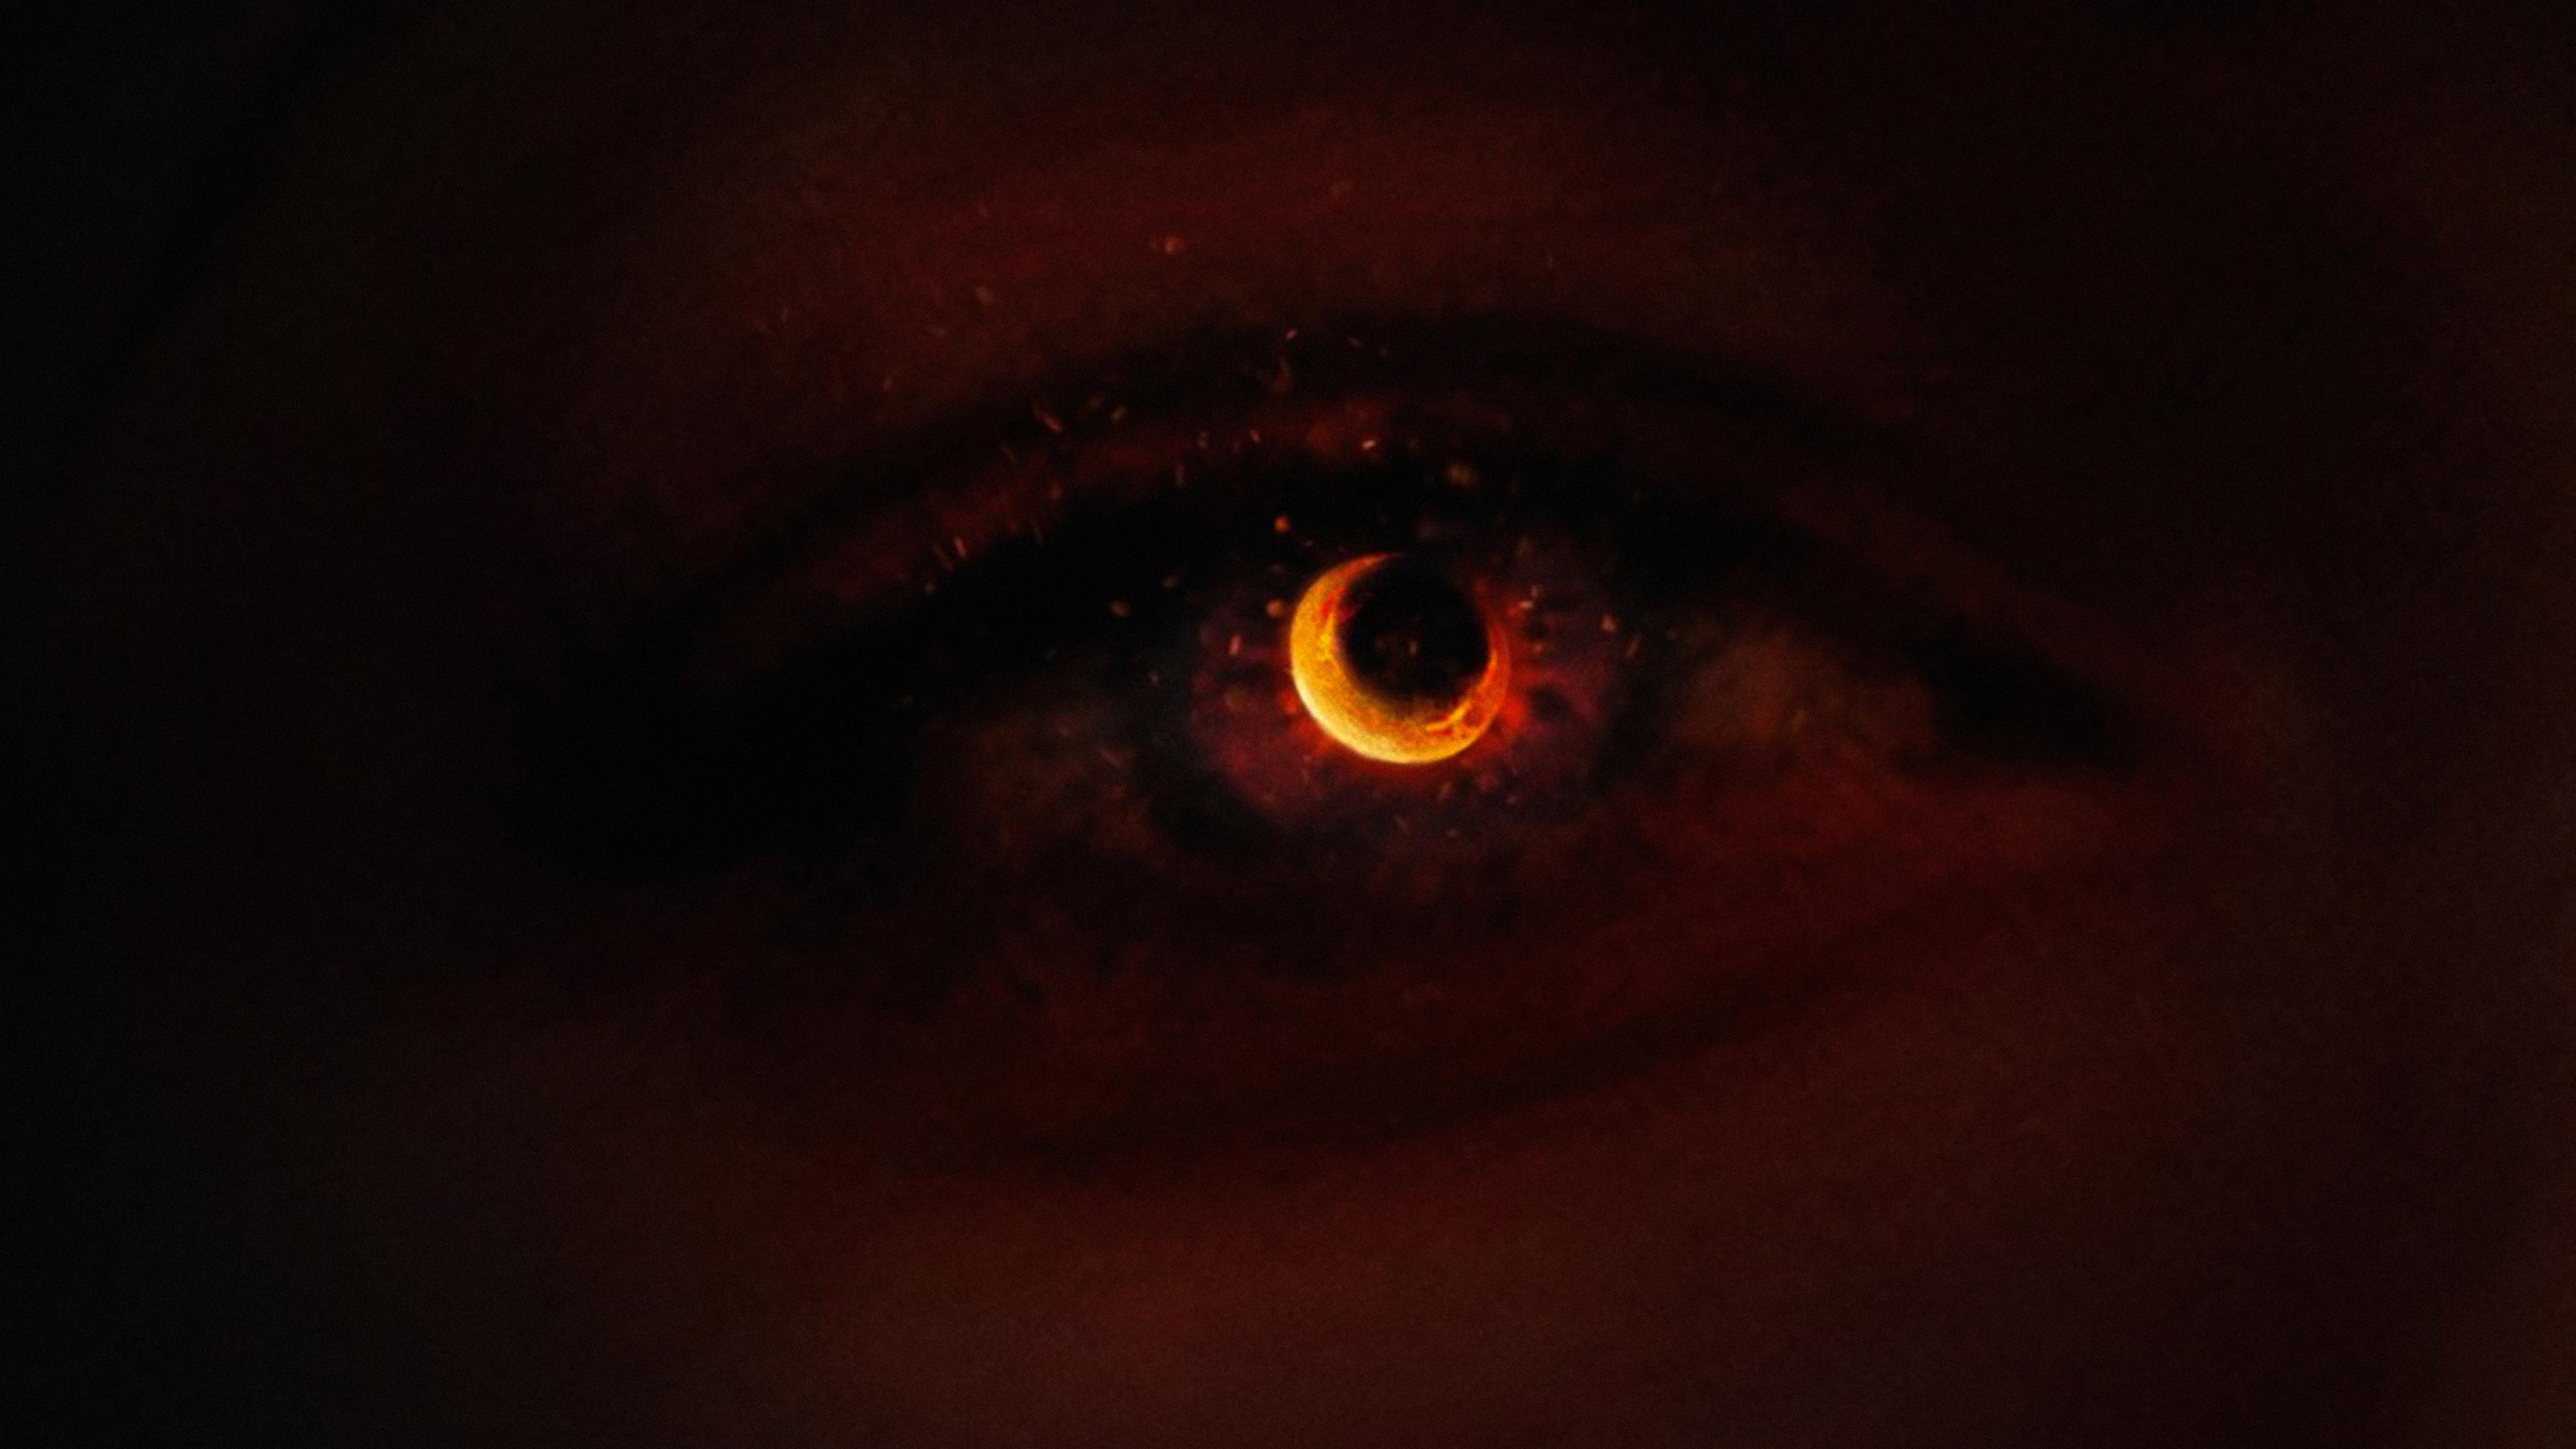 dark-phoenix-movie-5k-2019-01.jpg